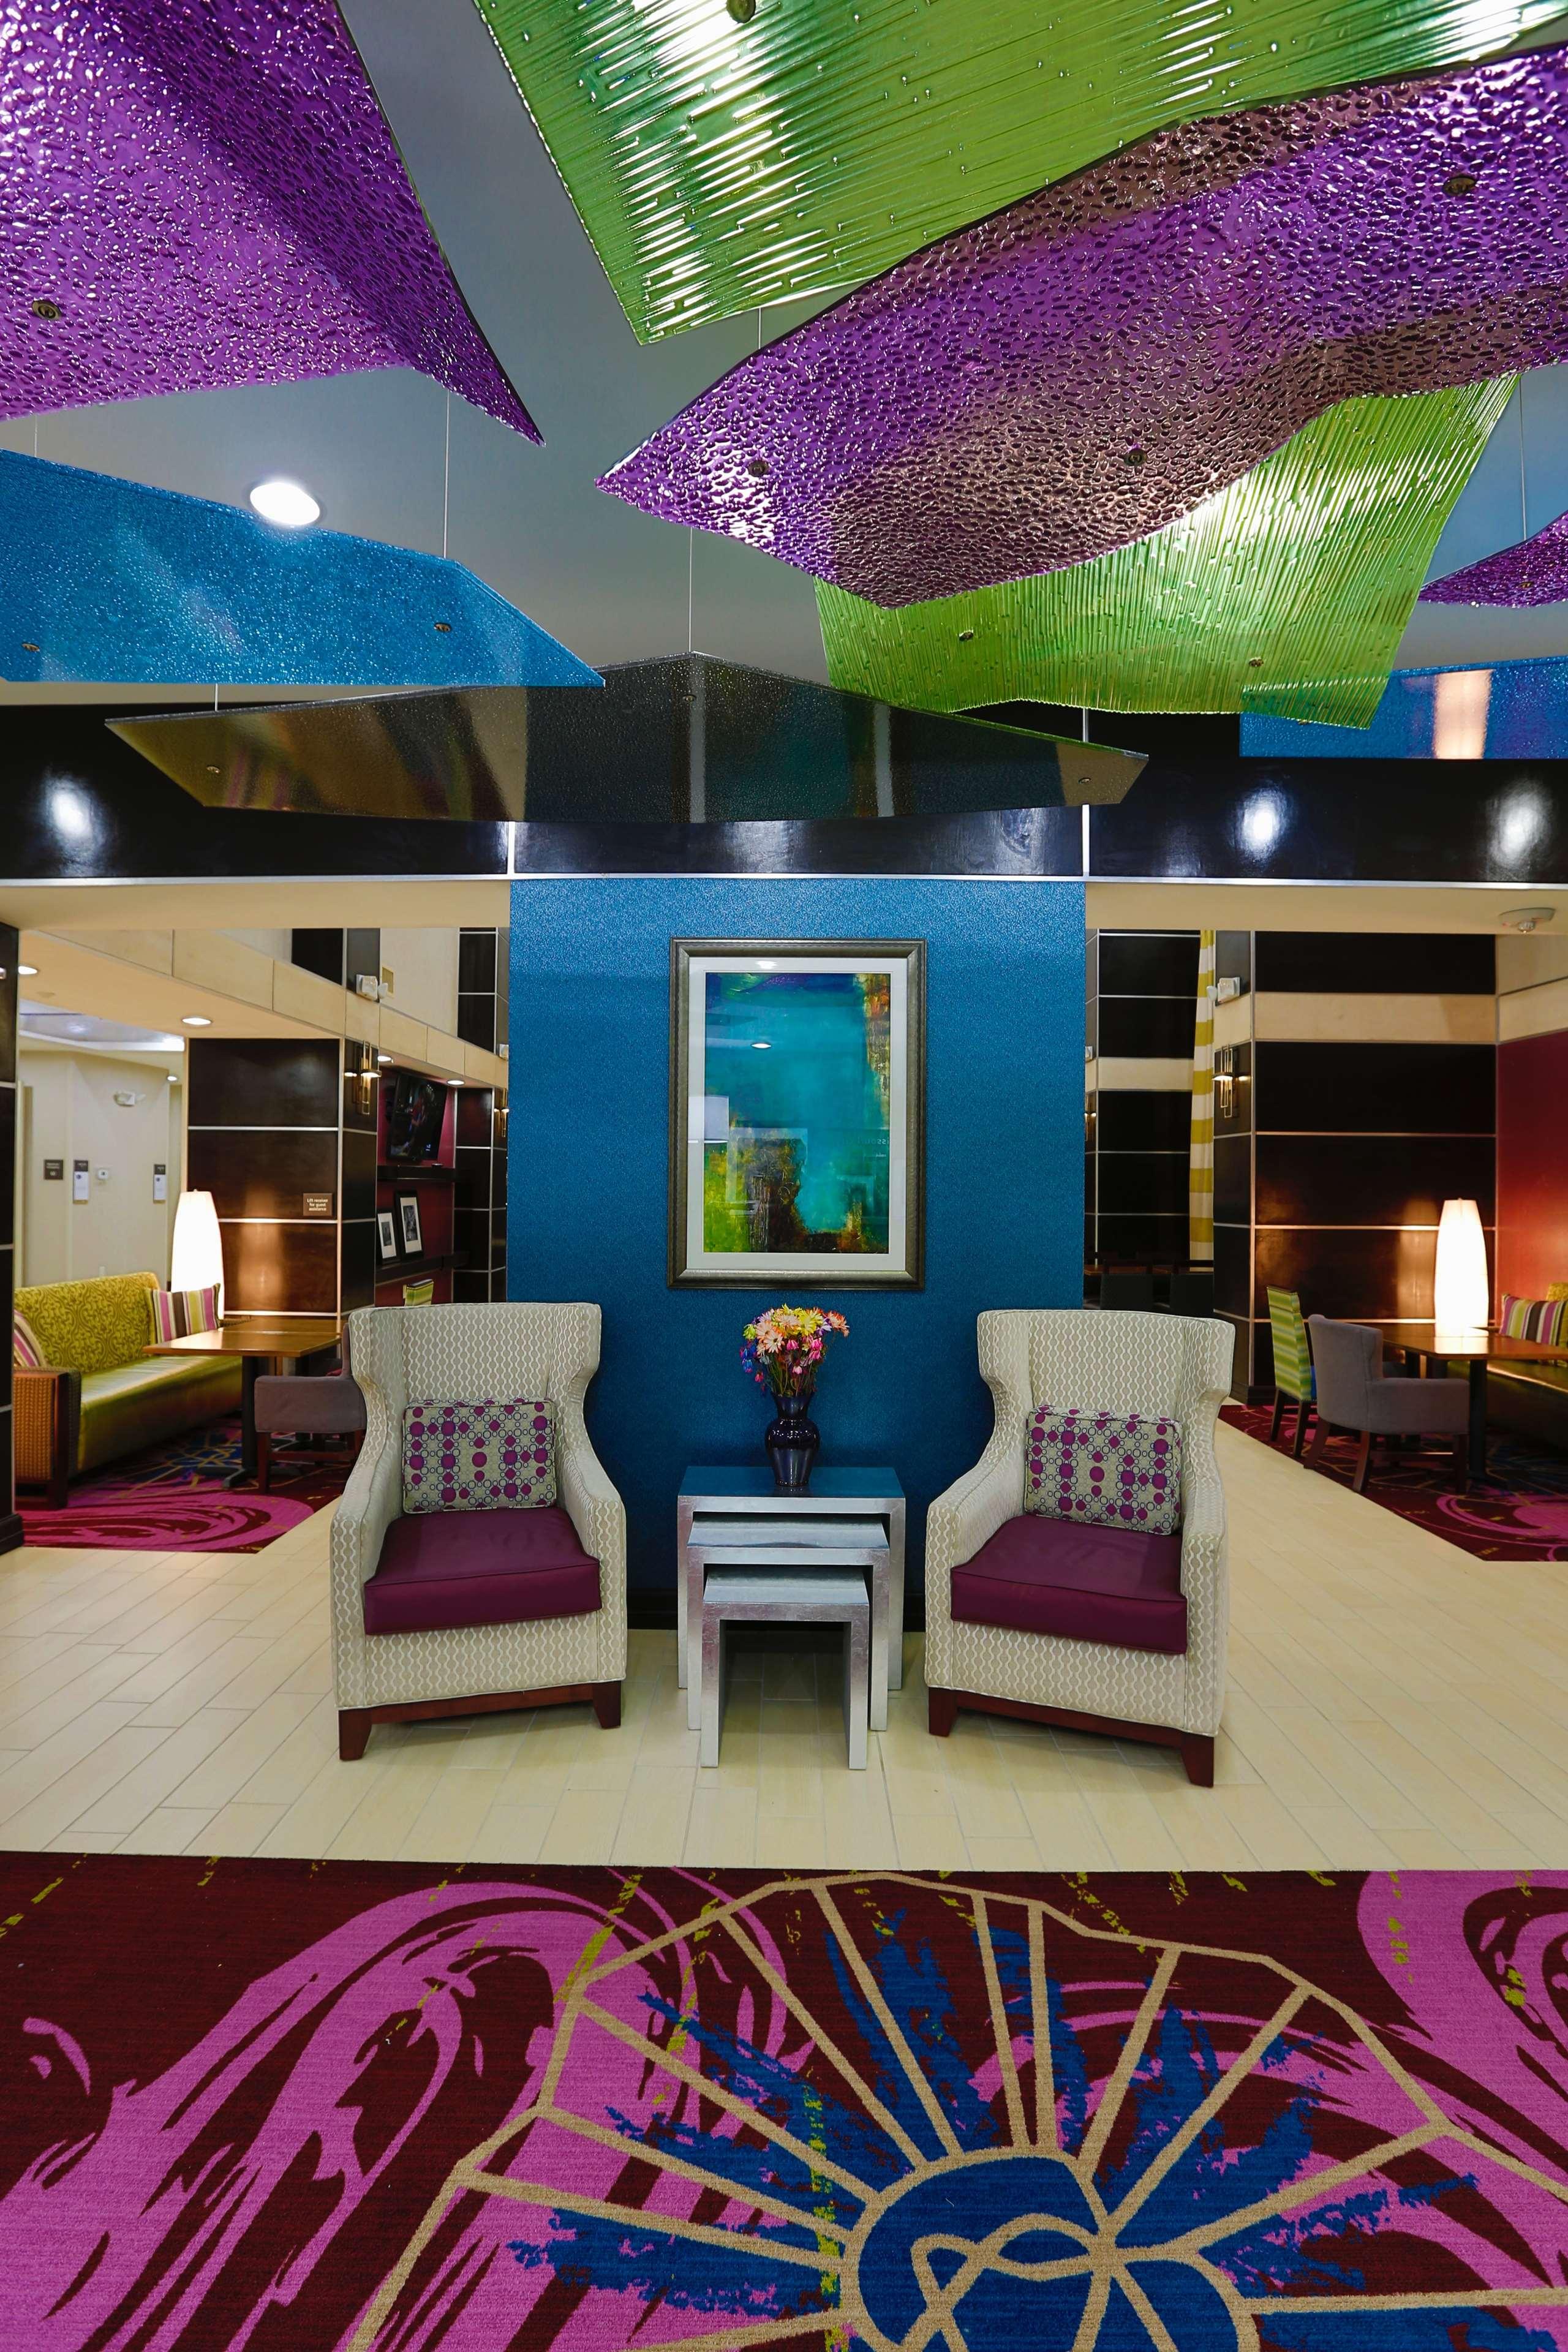 Hampton Inn & Suites Missouri City, TX image 9